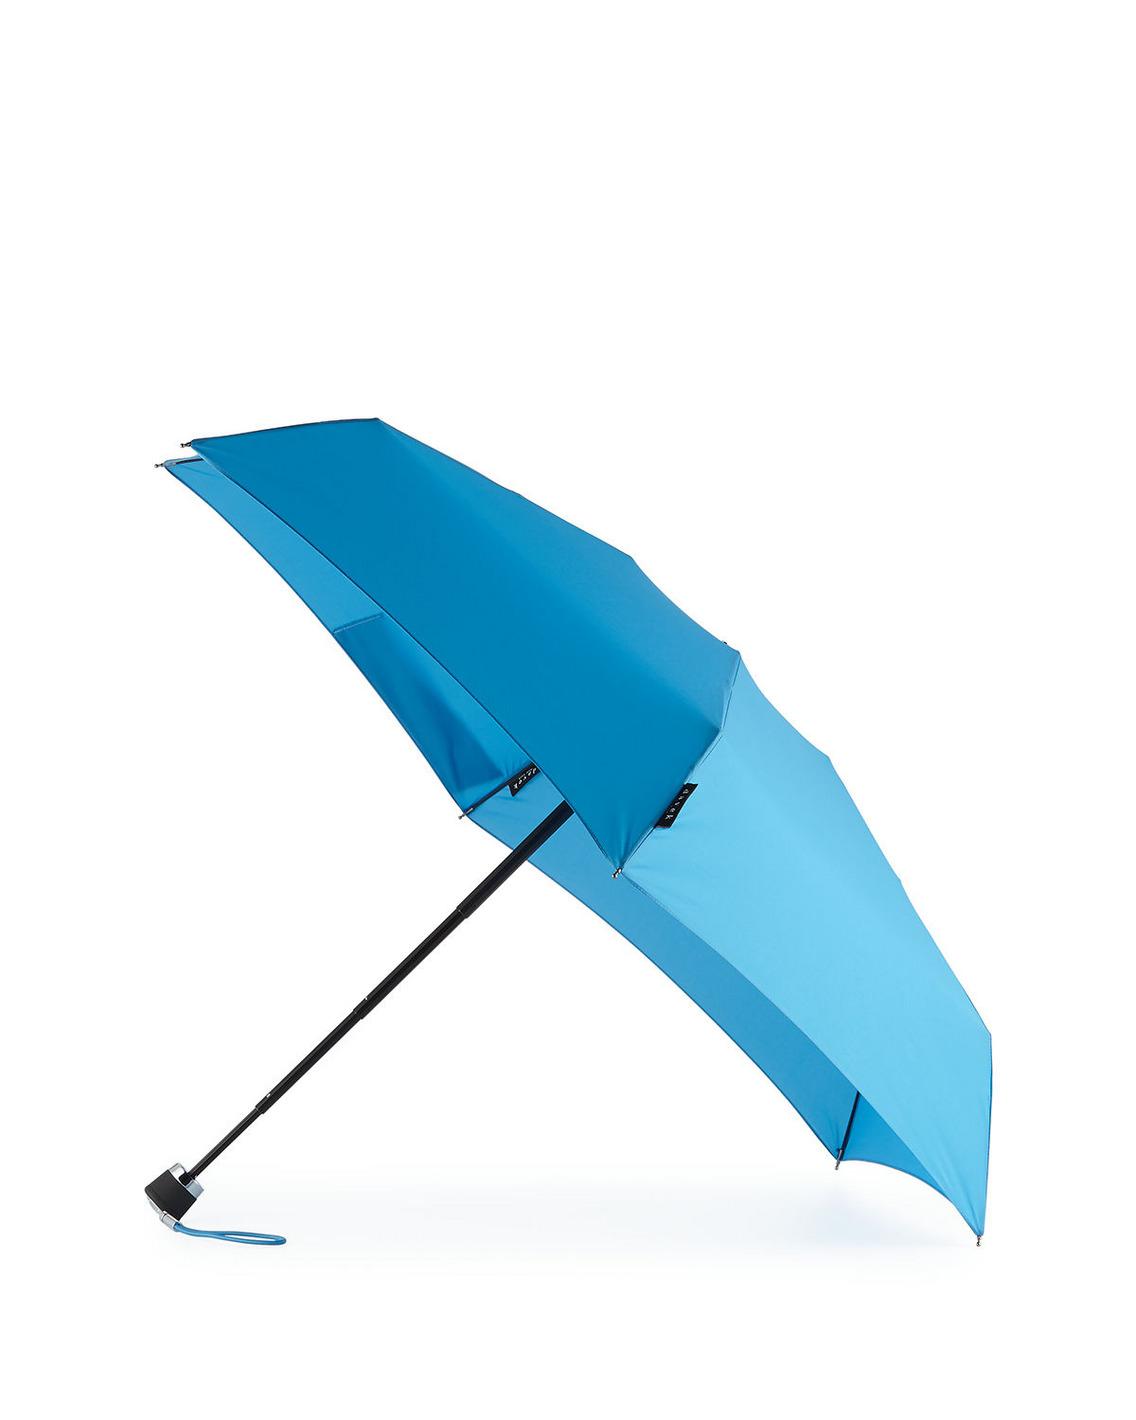 Davek Lightweight Mini Umbrella